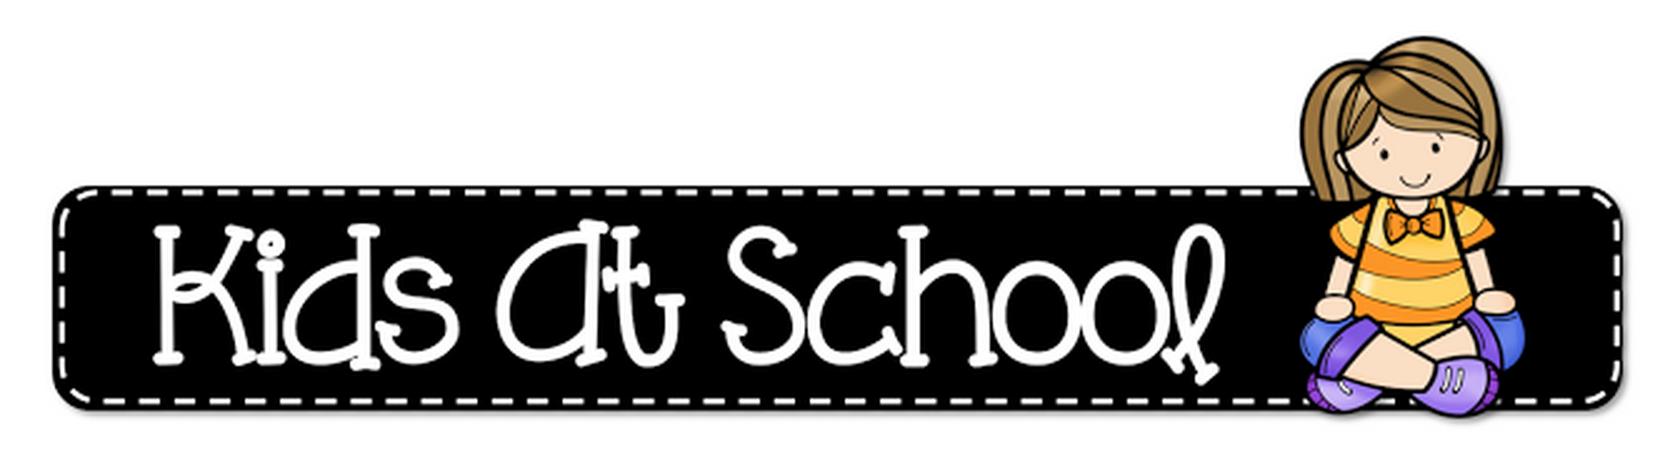 Header Clipart Kids At School